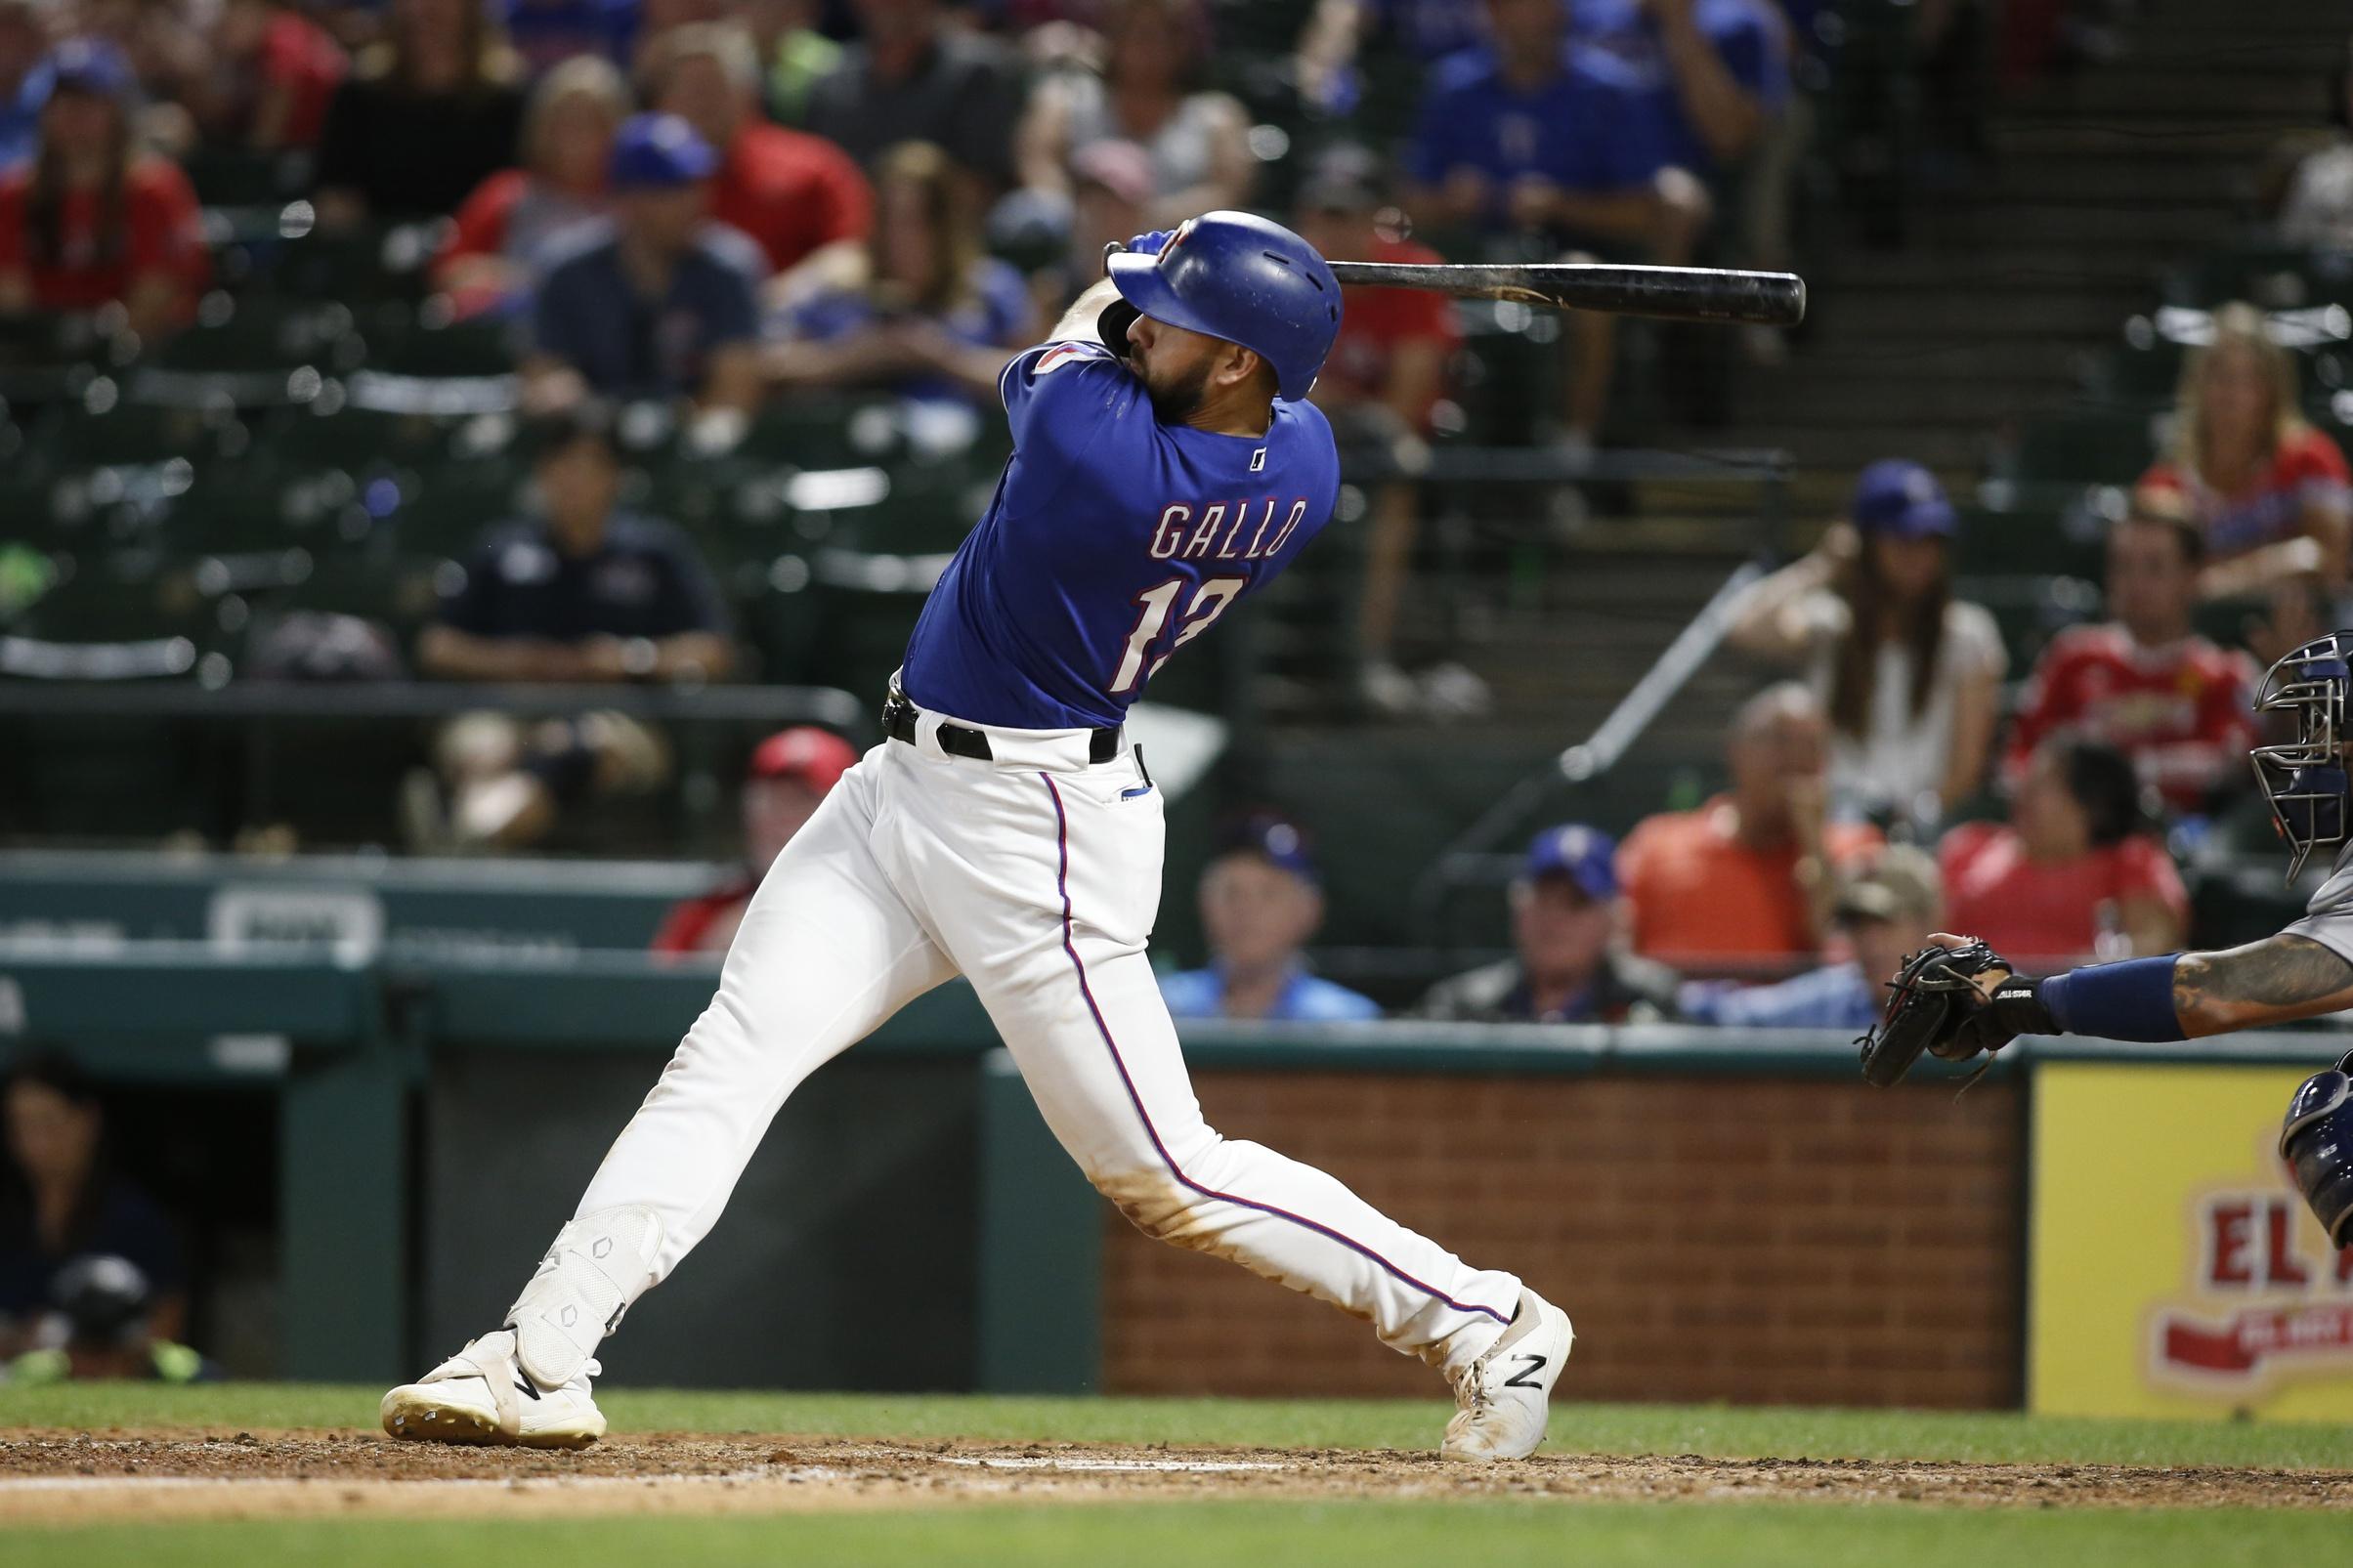 WATCH: Rangers' Joey Gallo unleashes 457-foot grand slam